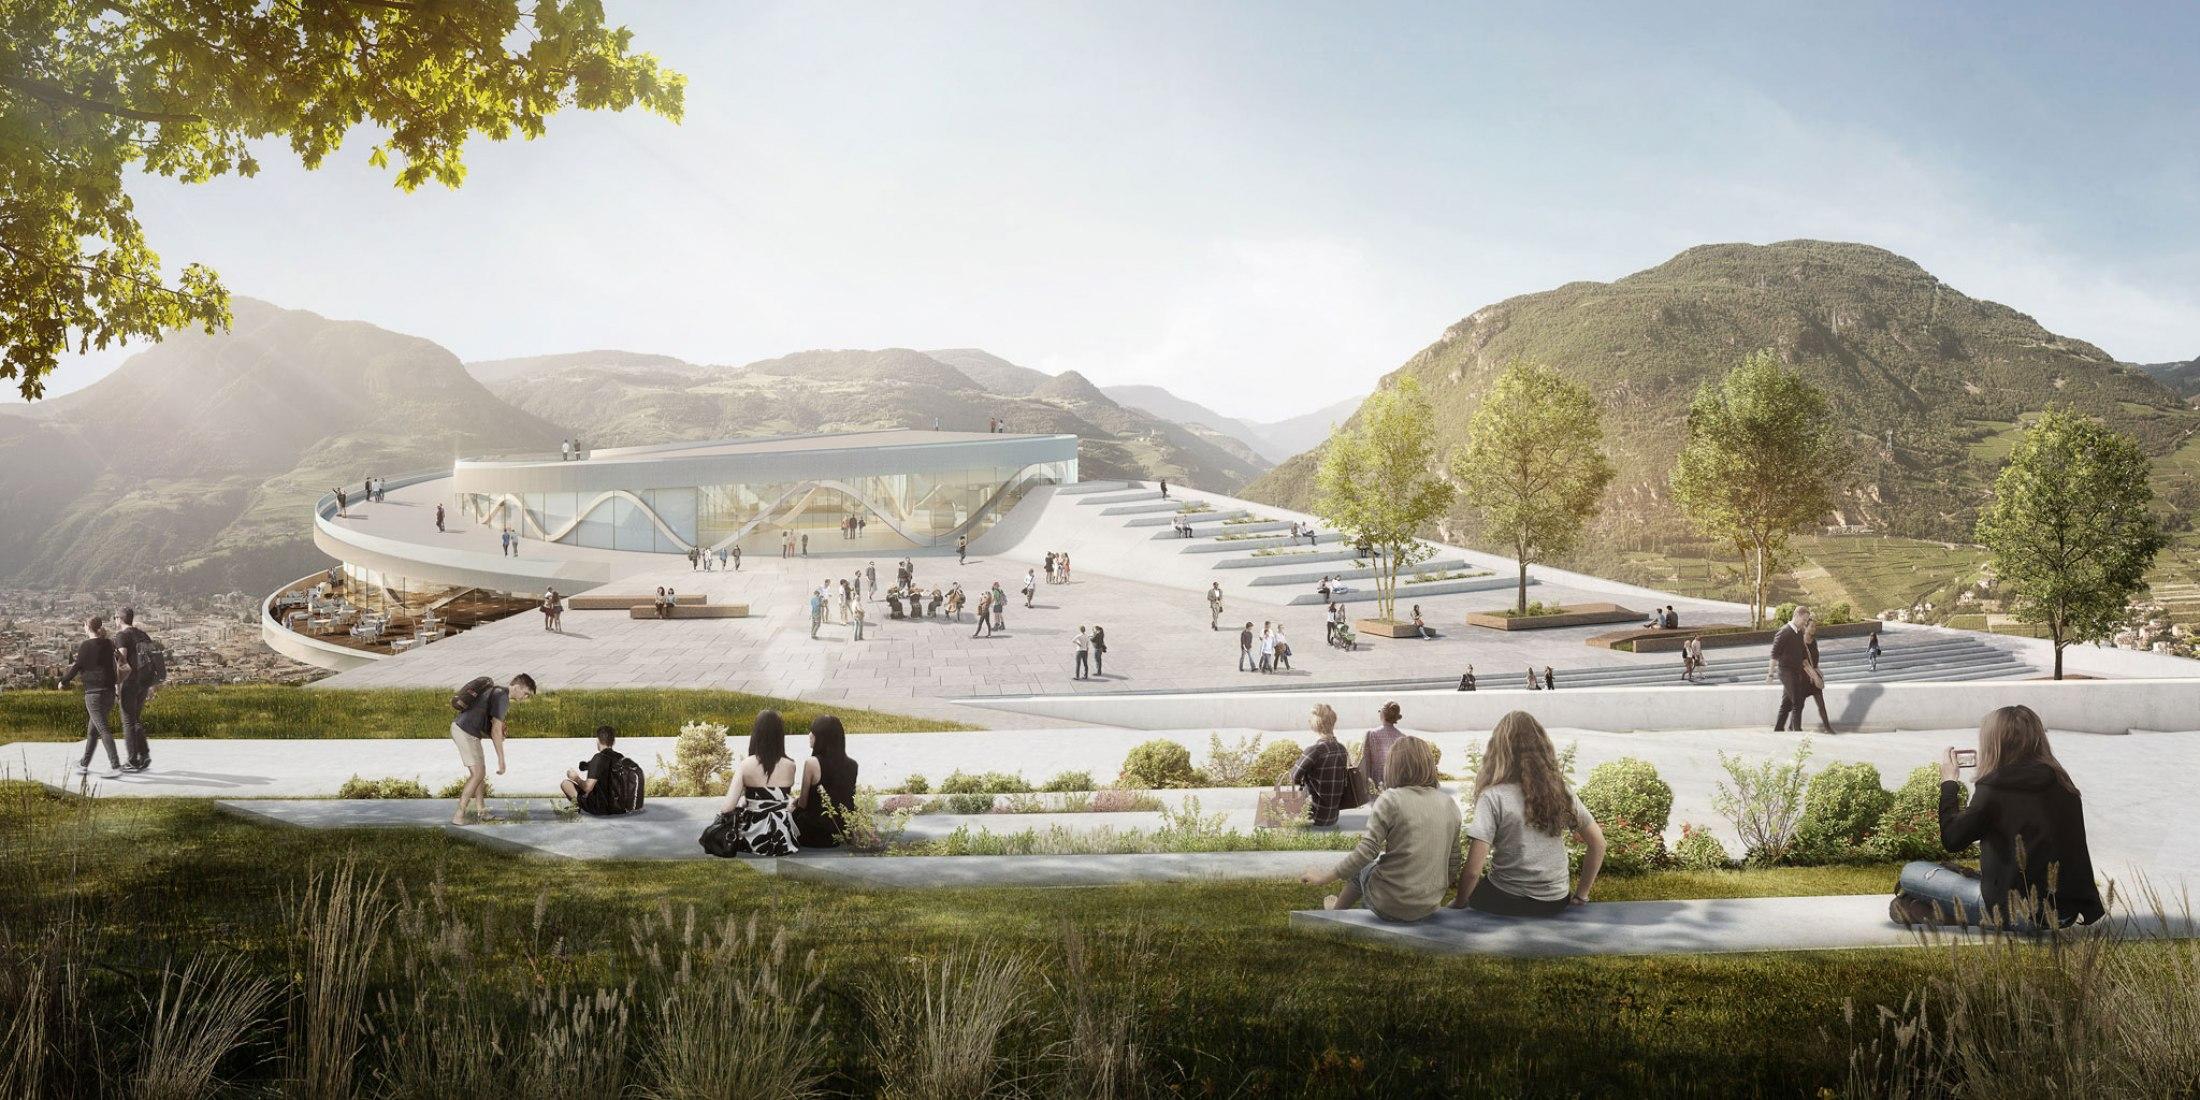 New Museum Quarter on top of the Virgl Mountain. Image courtesy of Snøhetta y moka-studio.